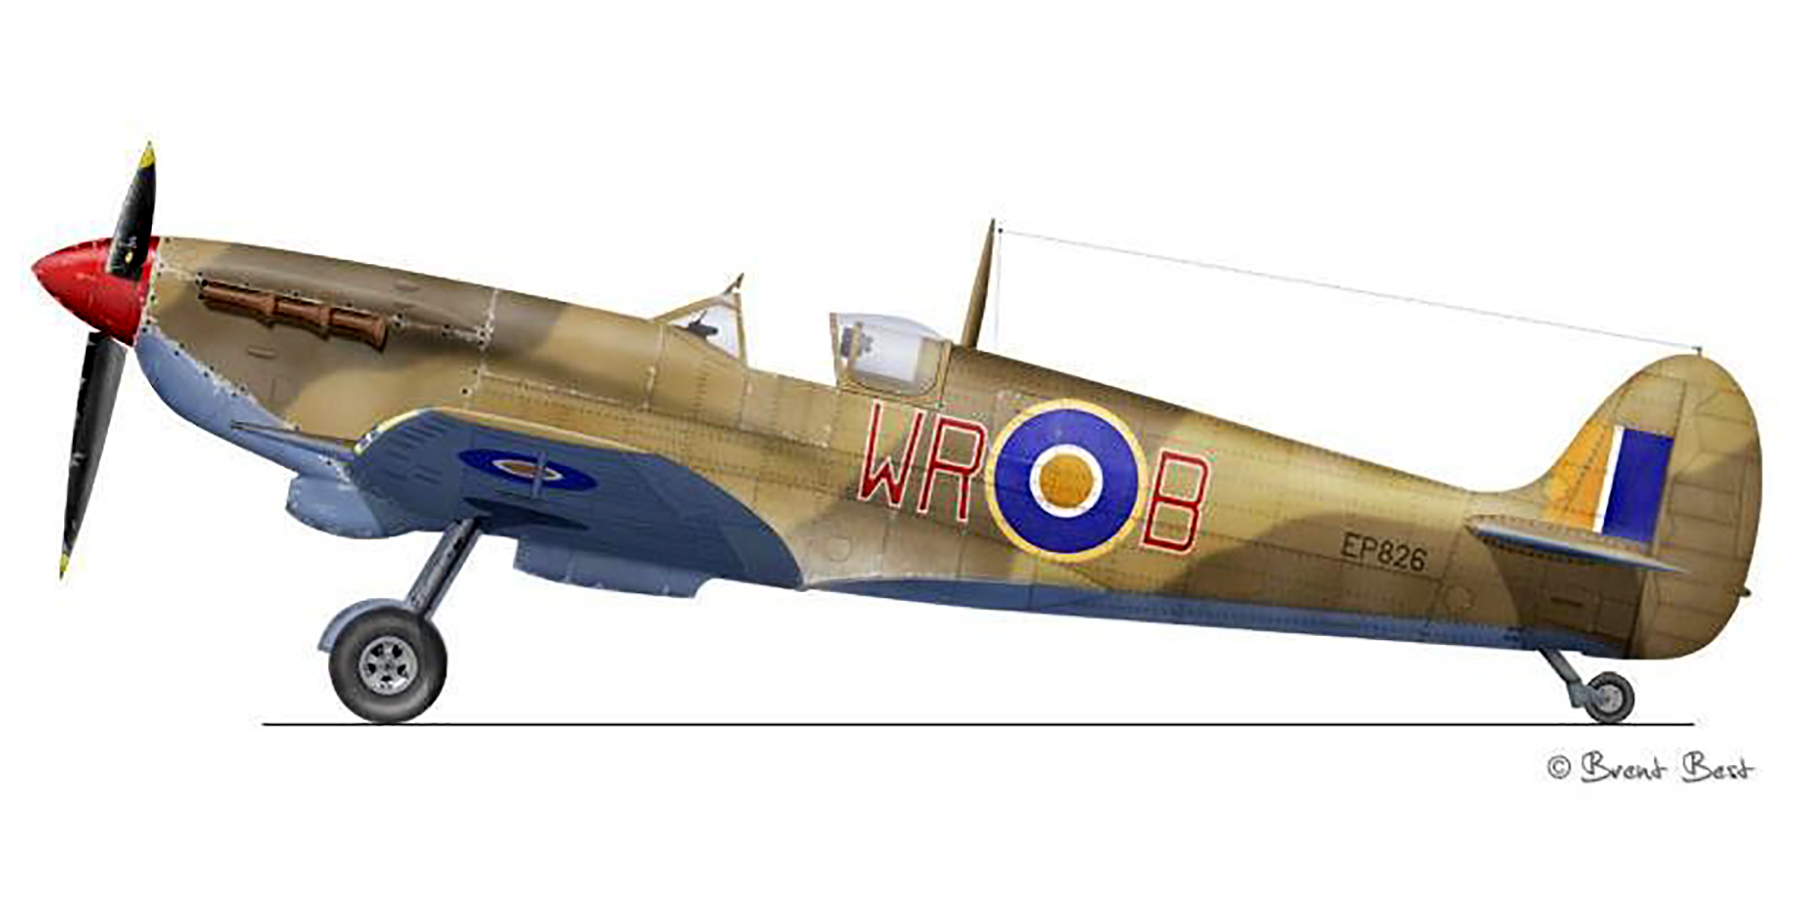 Spitfire LFVb SAAF 40Sqn WRB Aboukir filter F24 camera EP826 Sicily 1943 0A